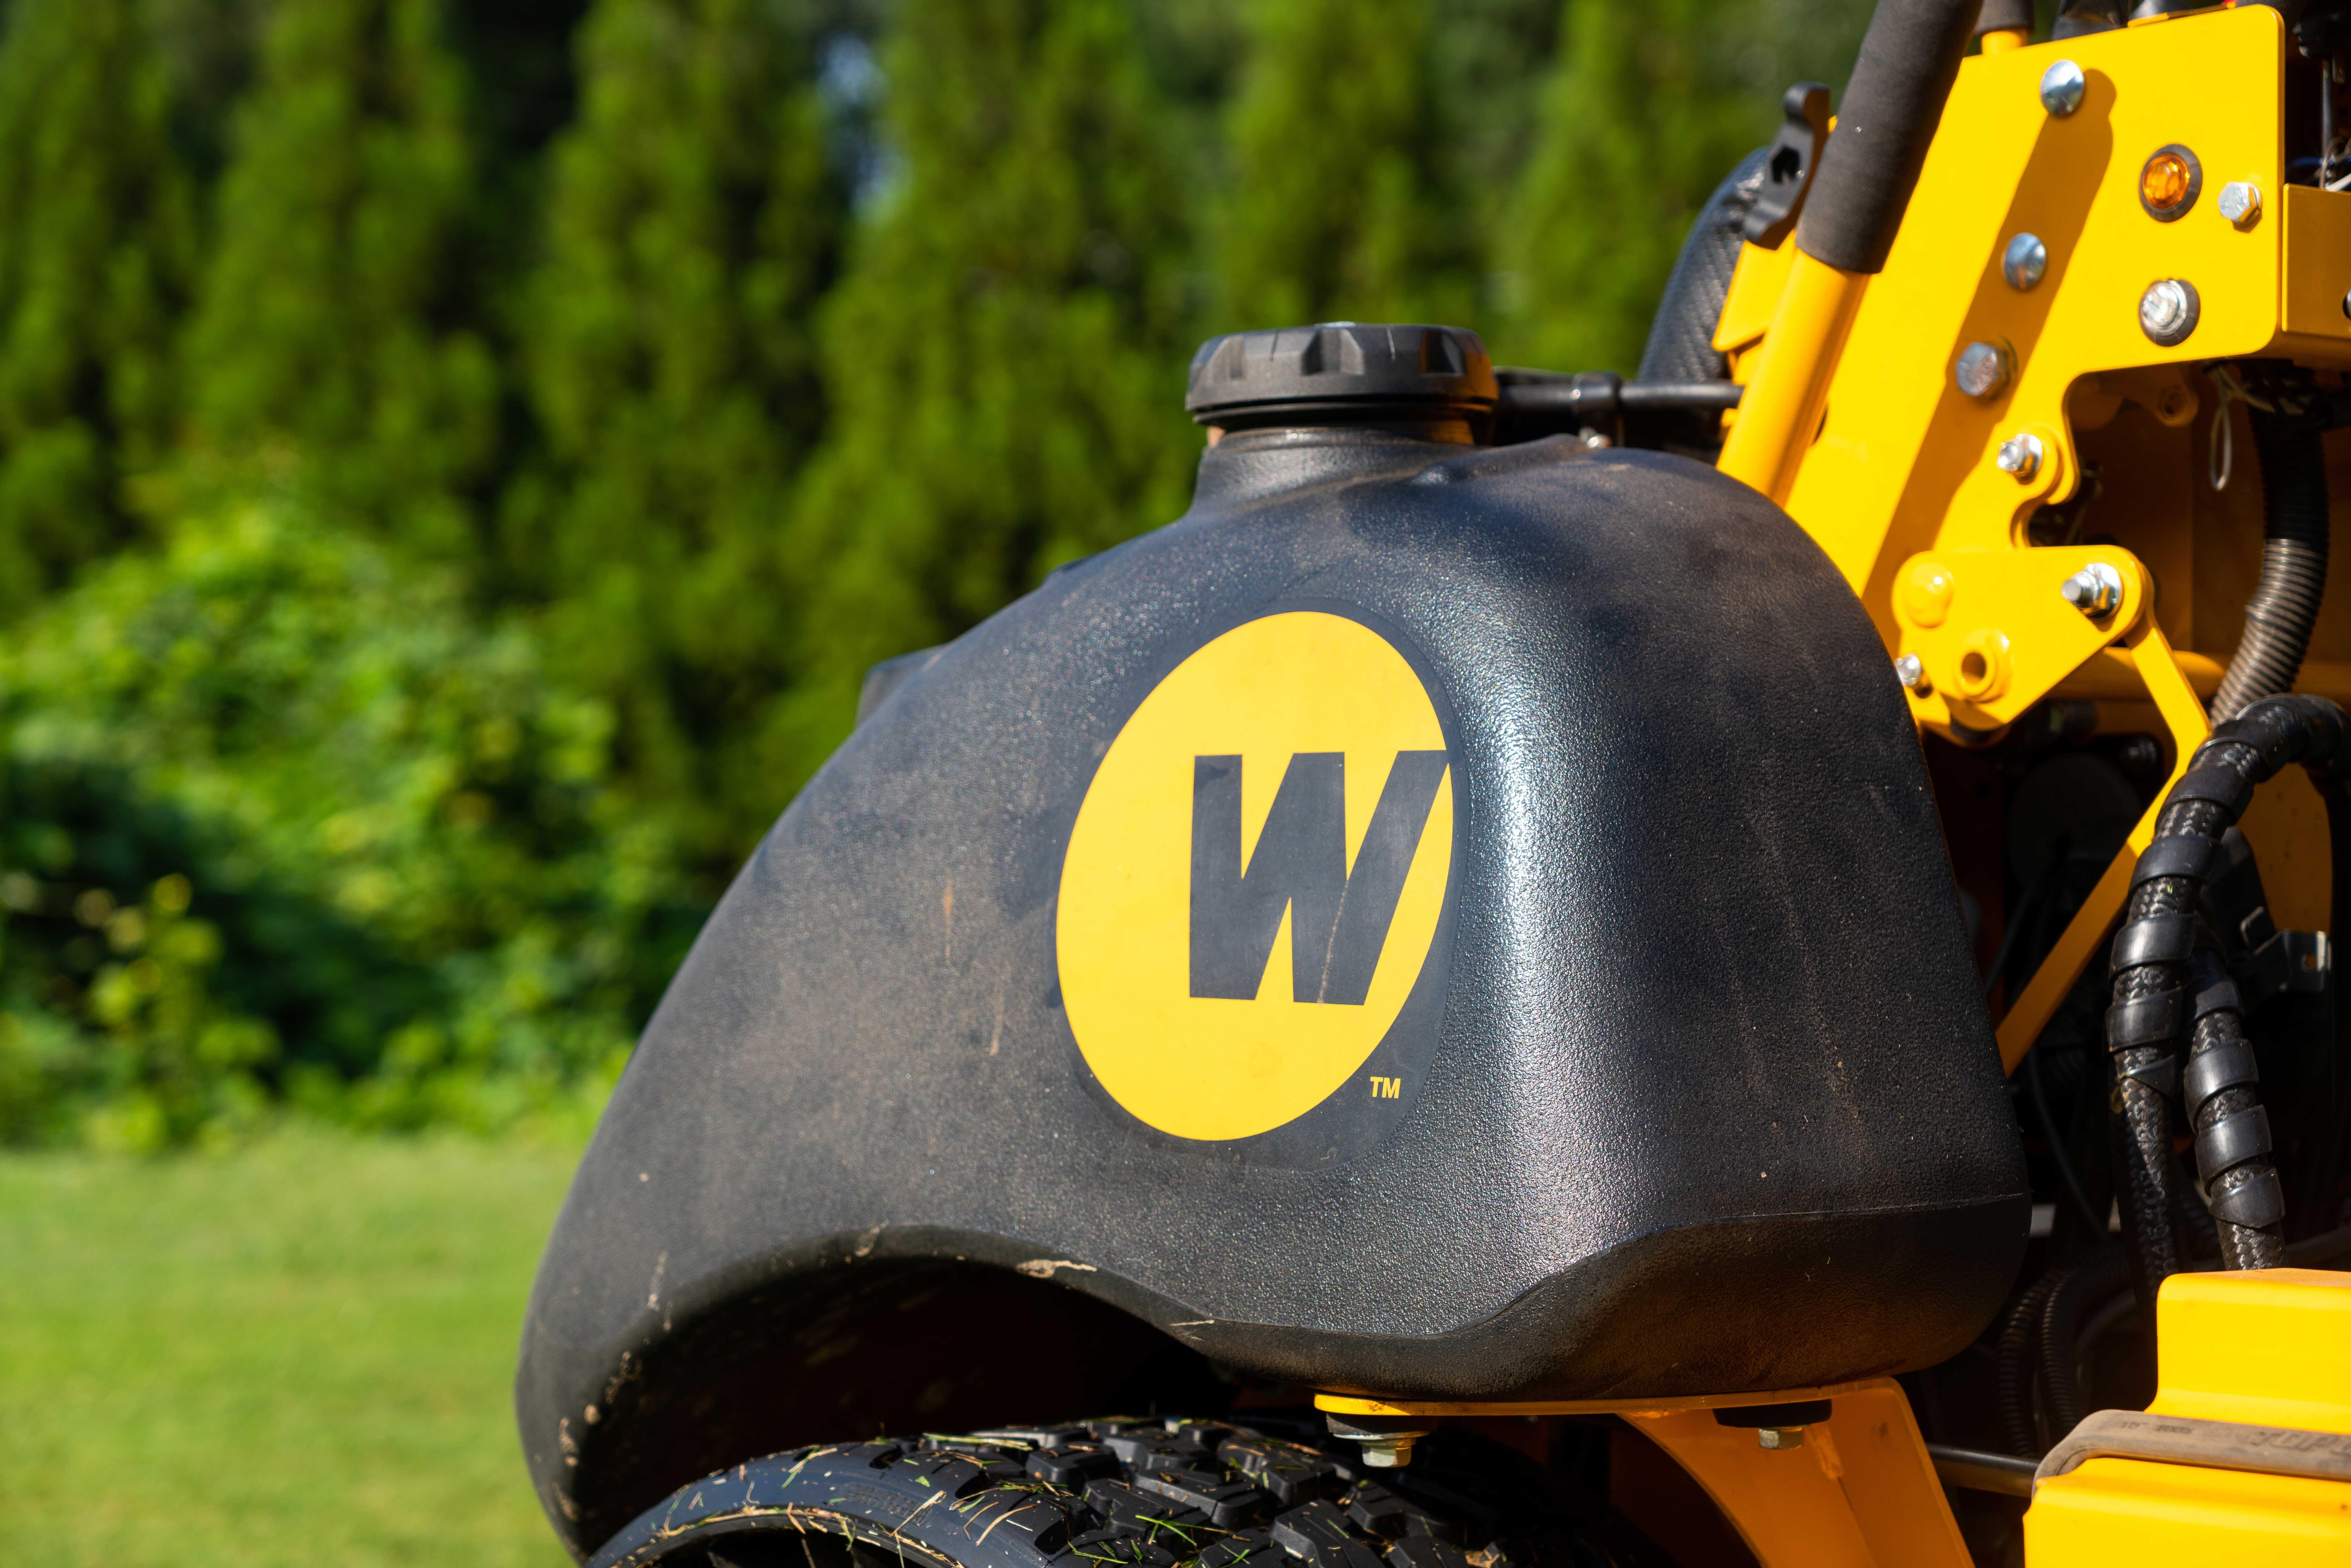 Wright logo on side of mower